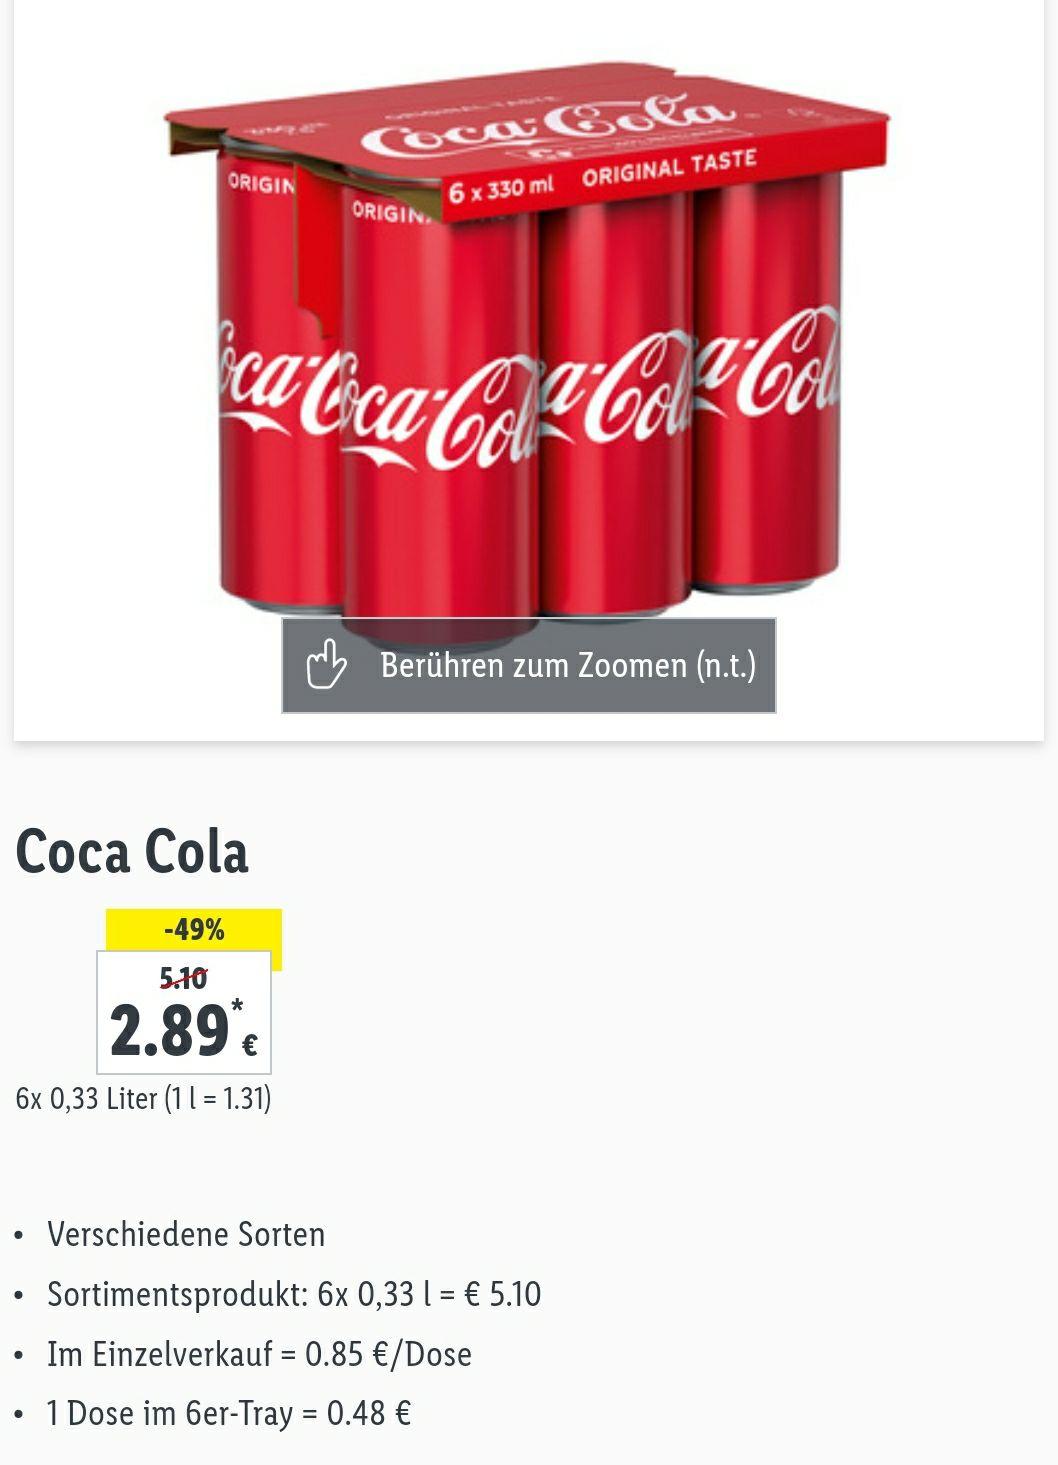 Lidl Super Wochenende - 6er Tray Coca Cola